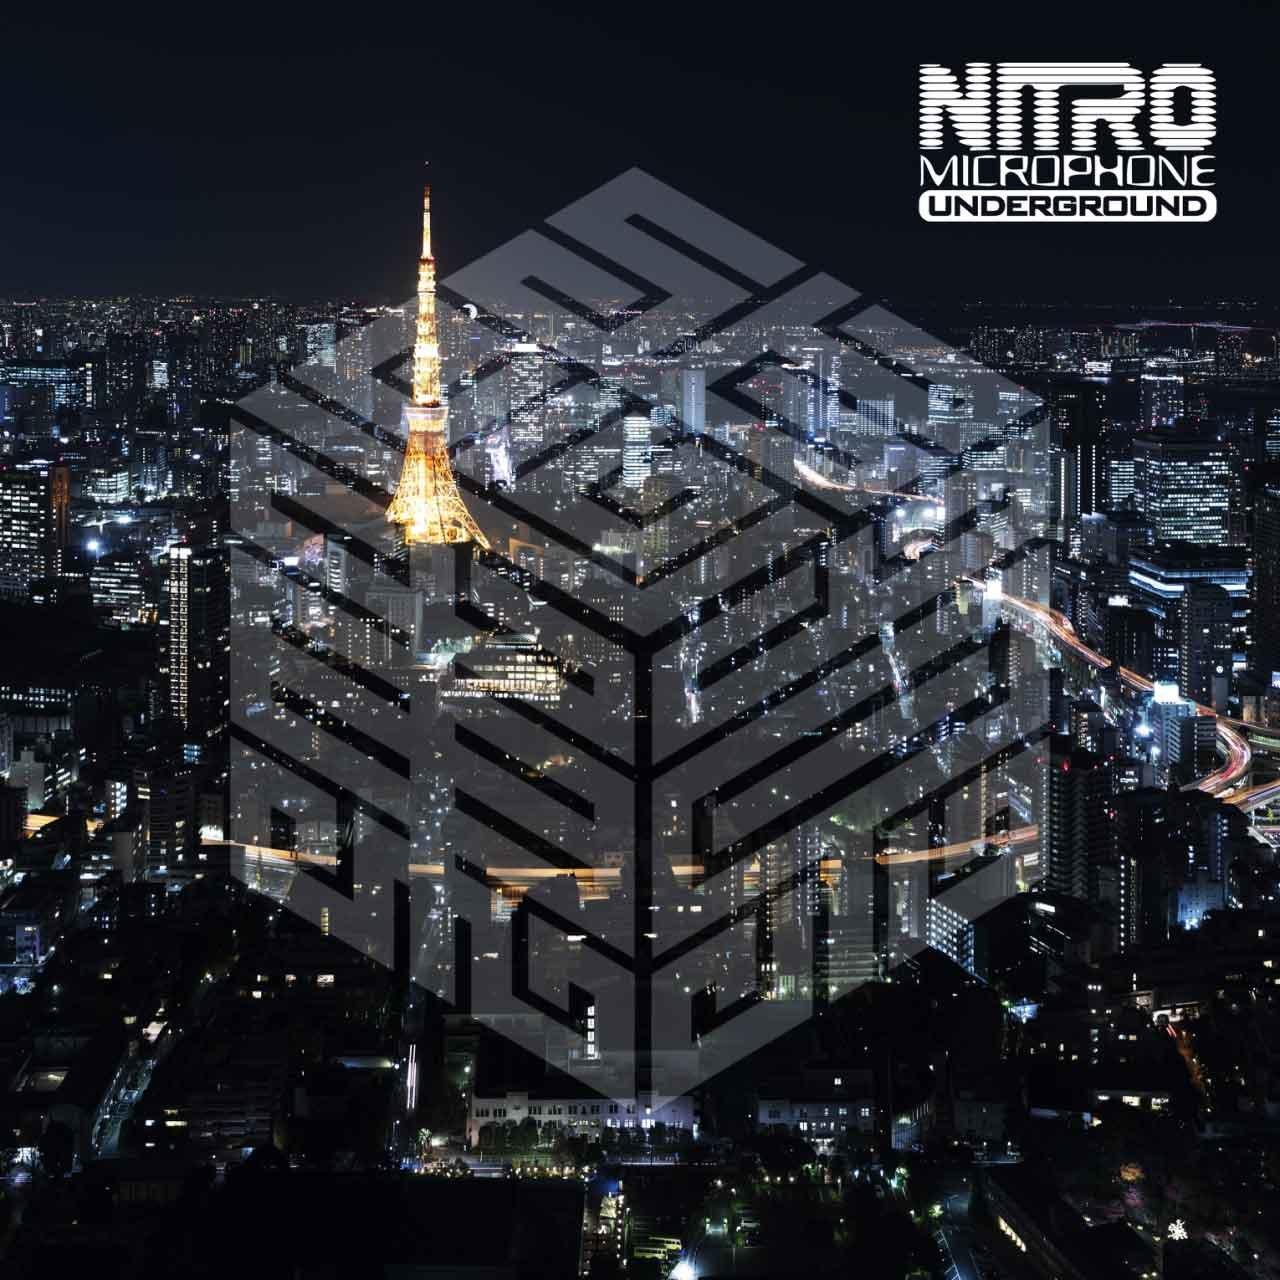 NITRO MICROPHONE UNDERGROUNDがライブ「LIVE20」を開催 MUSIC